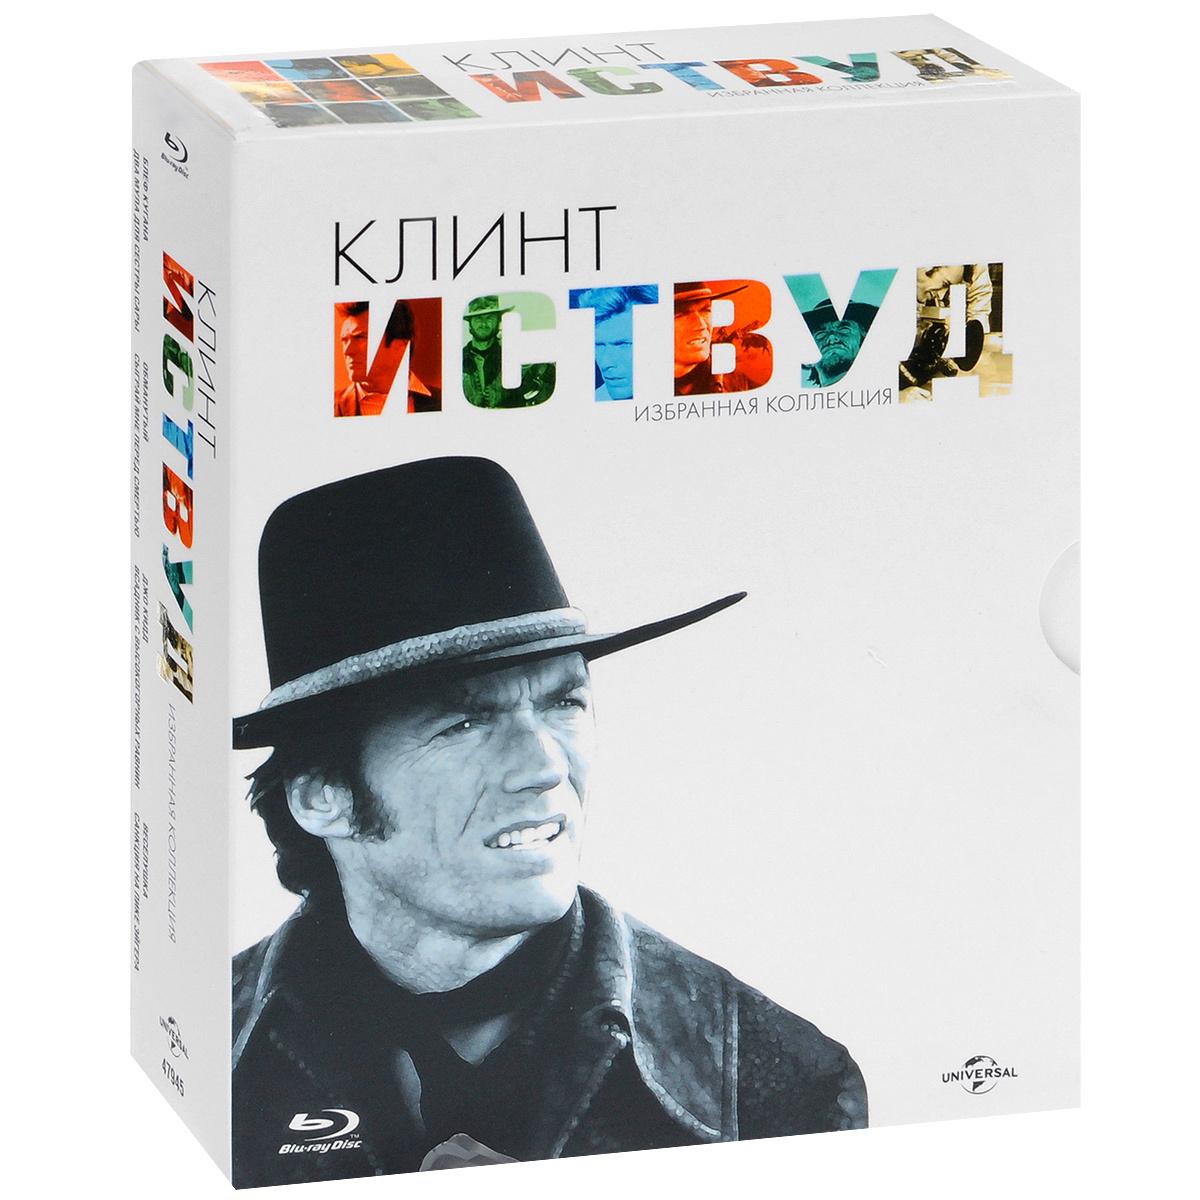 Коллекция фильмов Клинта Иствуда (8 Blu-ray) #1